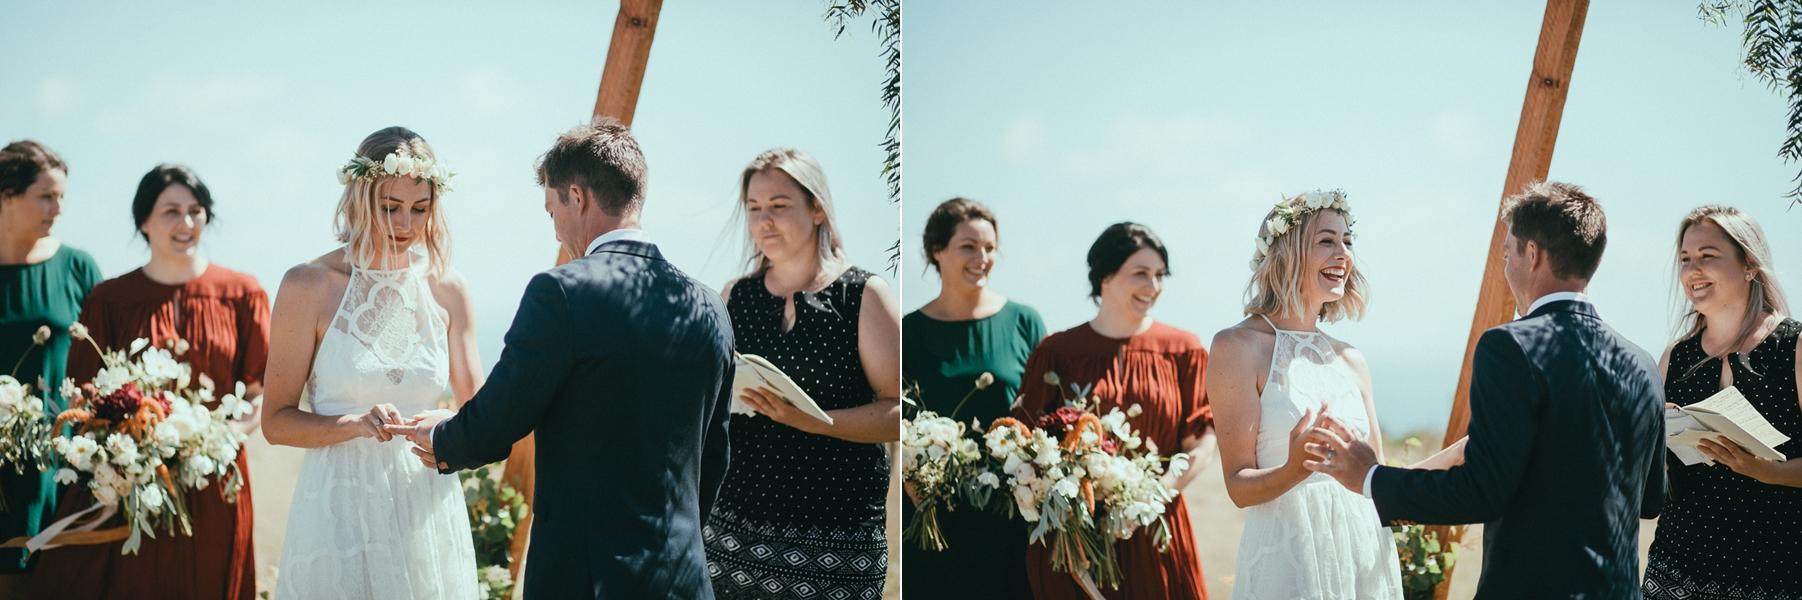 new-zealand-parihoa-wedding-photographer (48).jpg